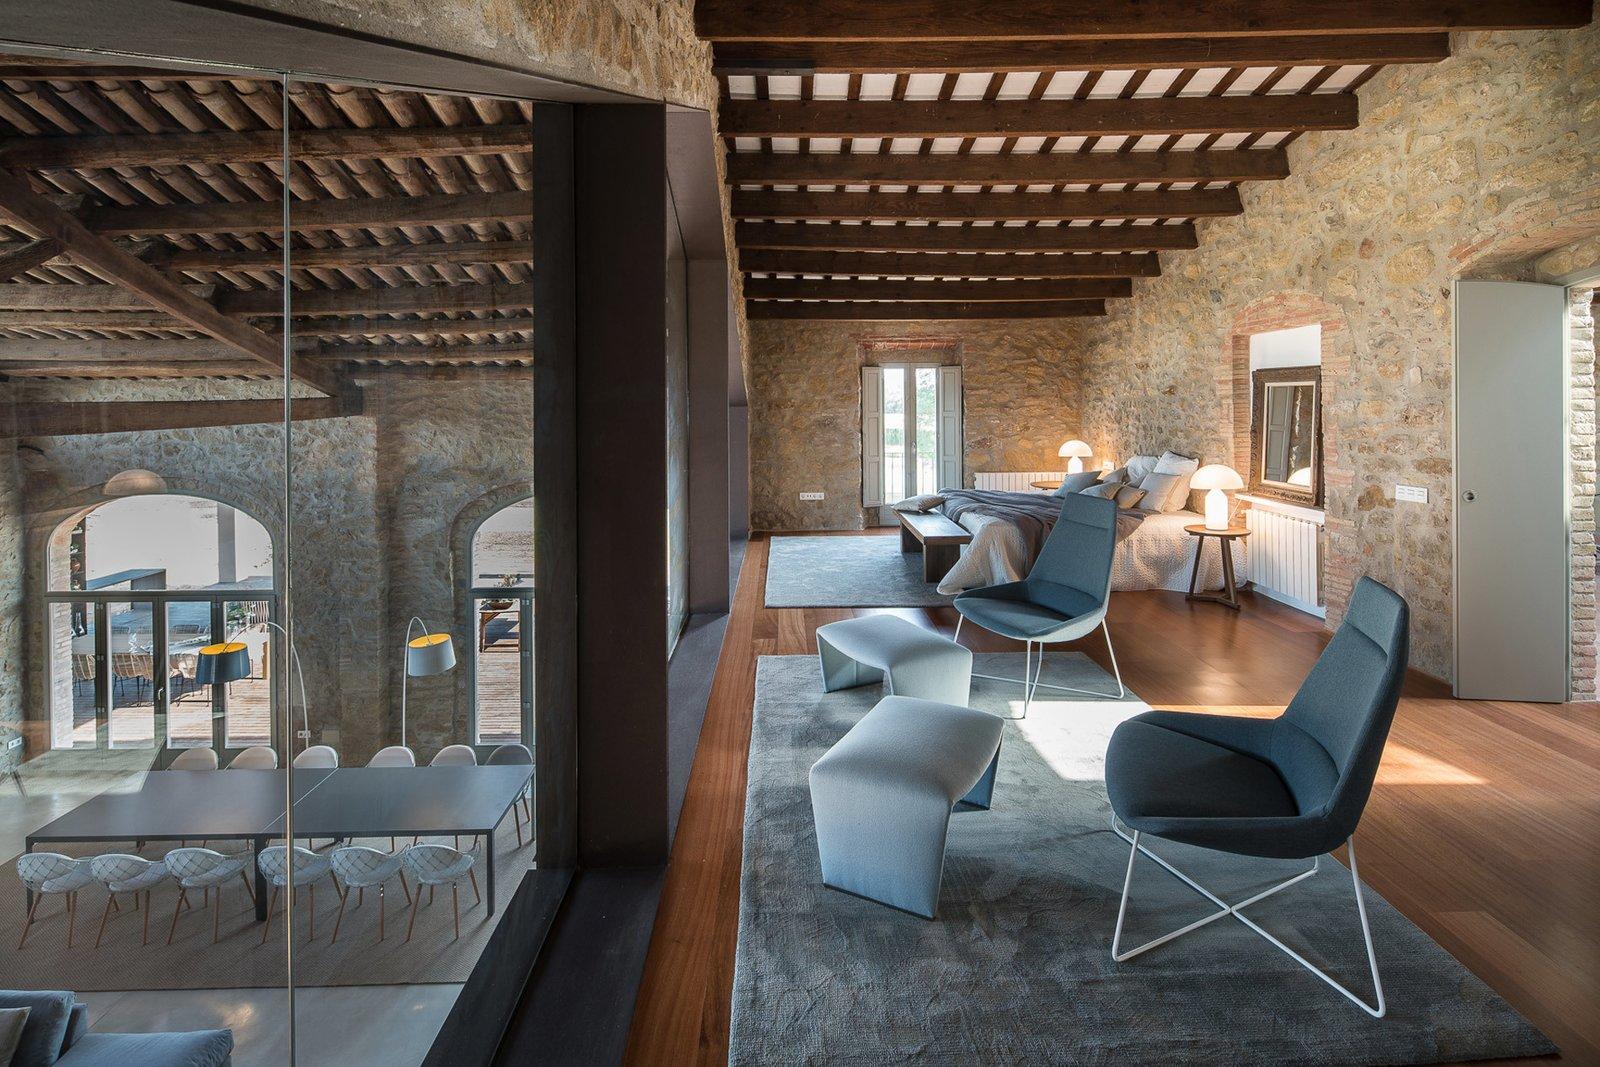 Farmhouse In Girona, Spain - Photo 5 of 14